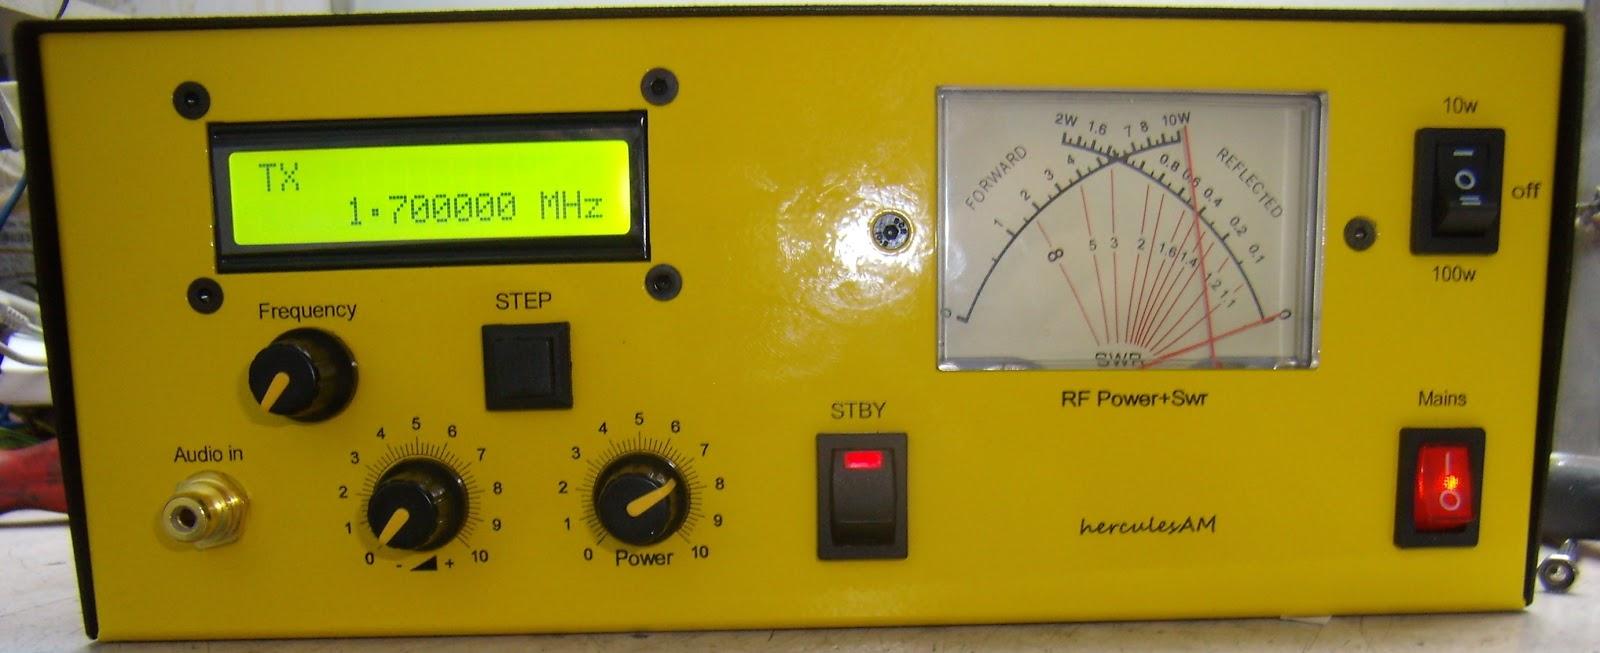 am dds transmitters: 10w am dds transmitter